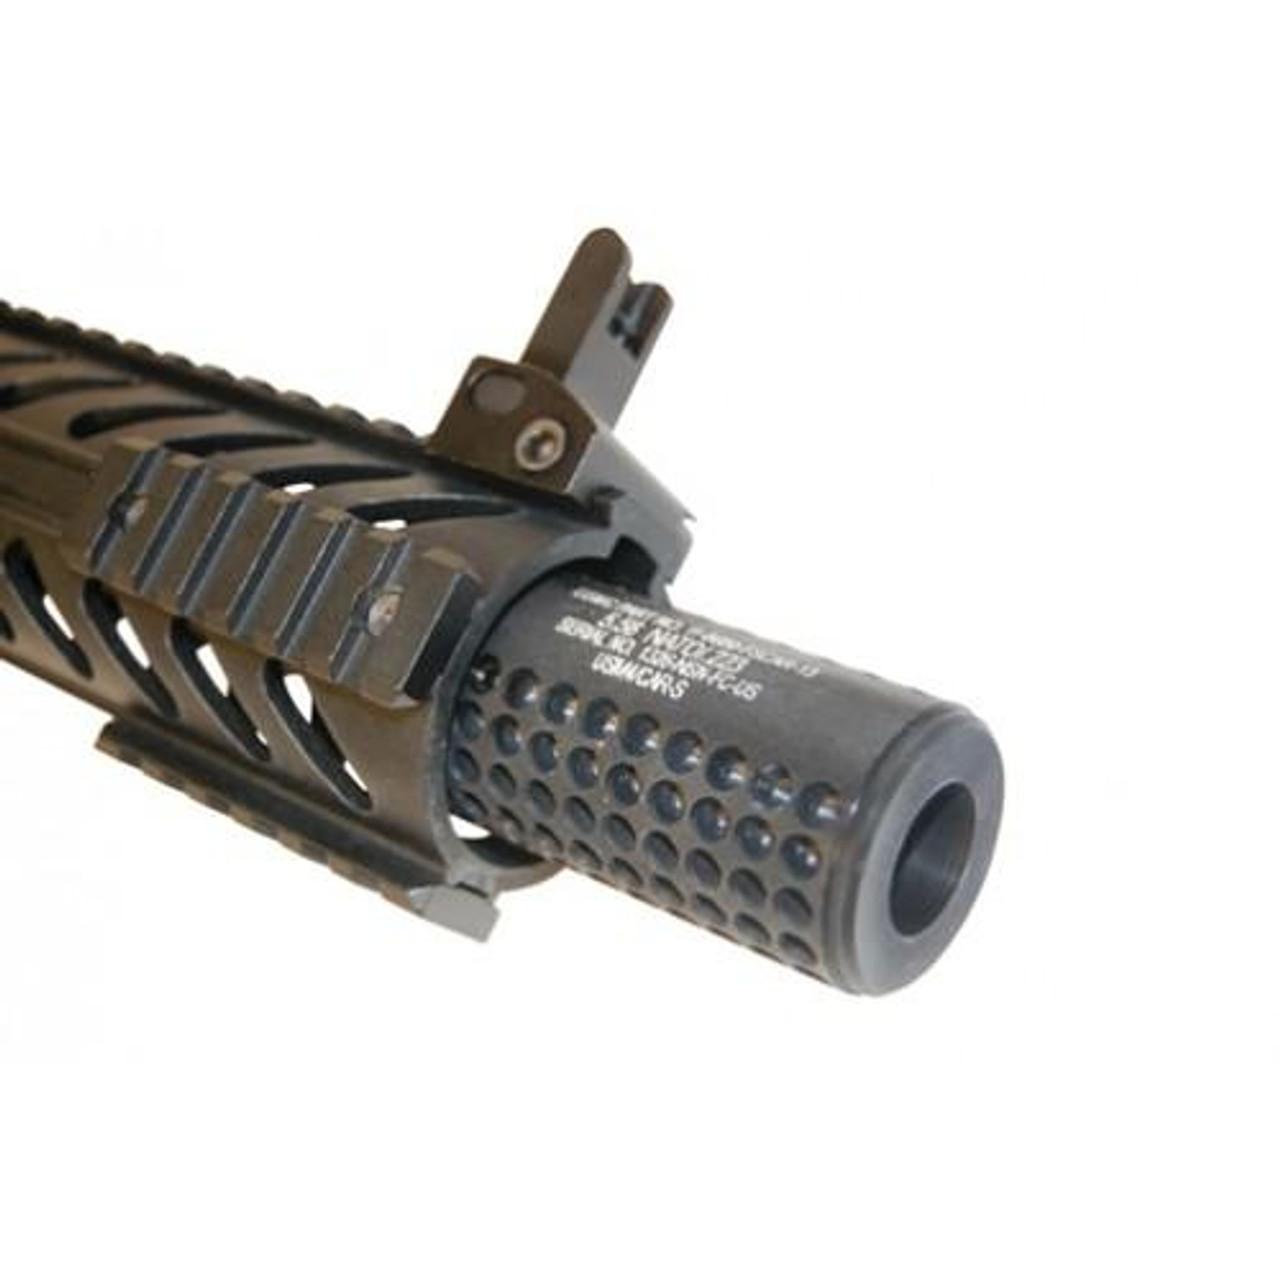 Guntech Micro Reverse Thread Slip Over SOCOM Style Fake Suppressor